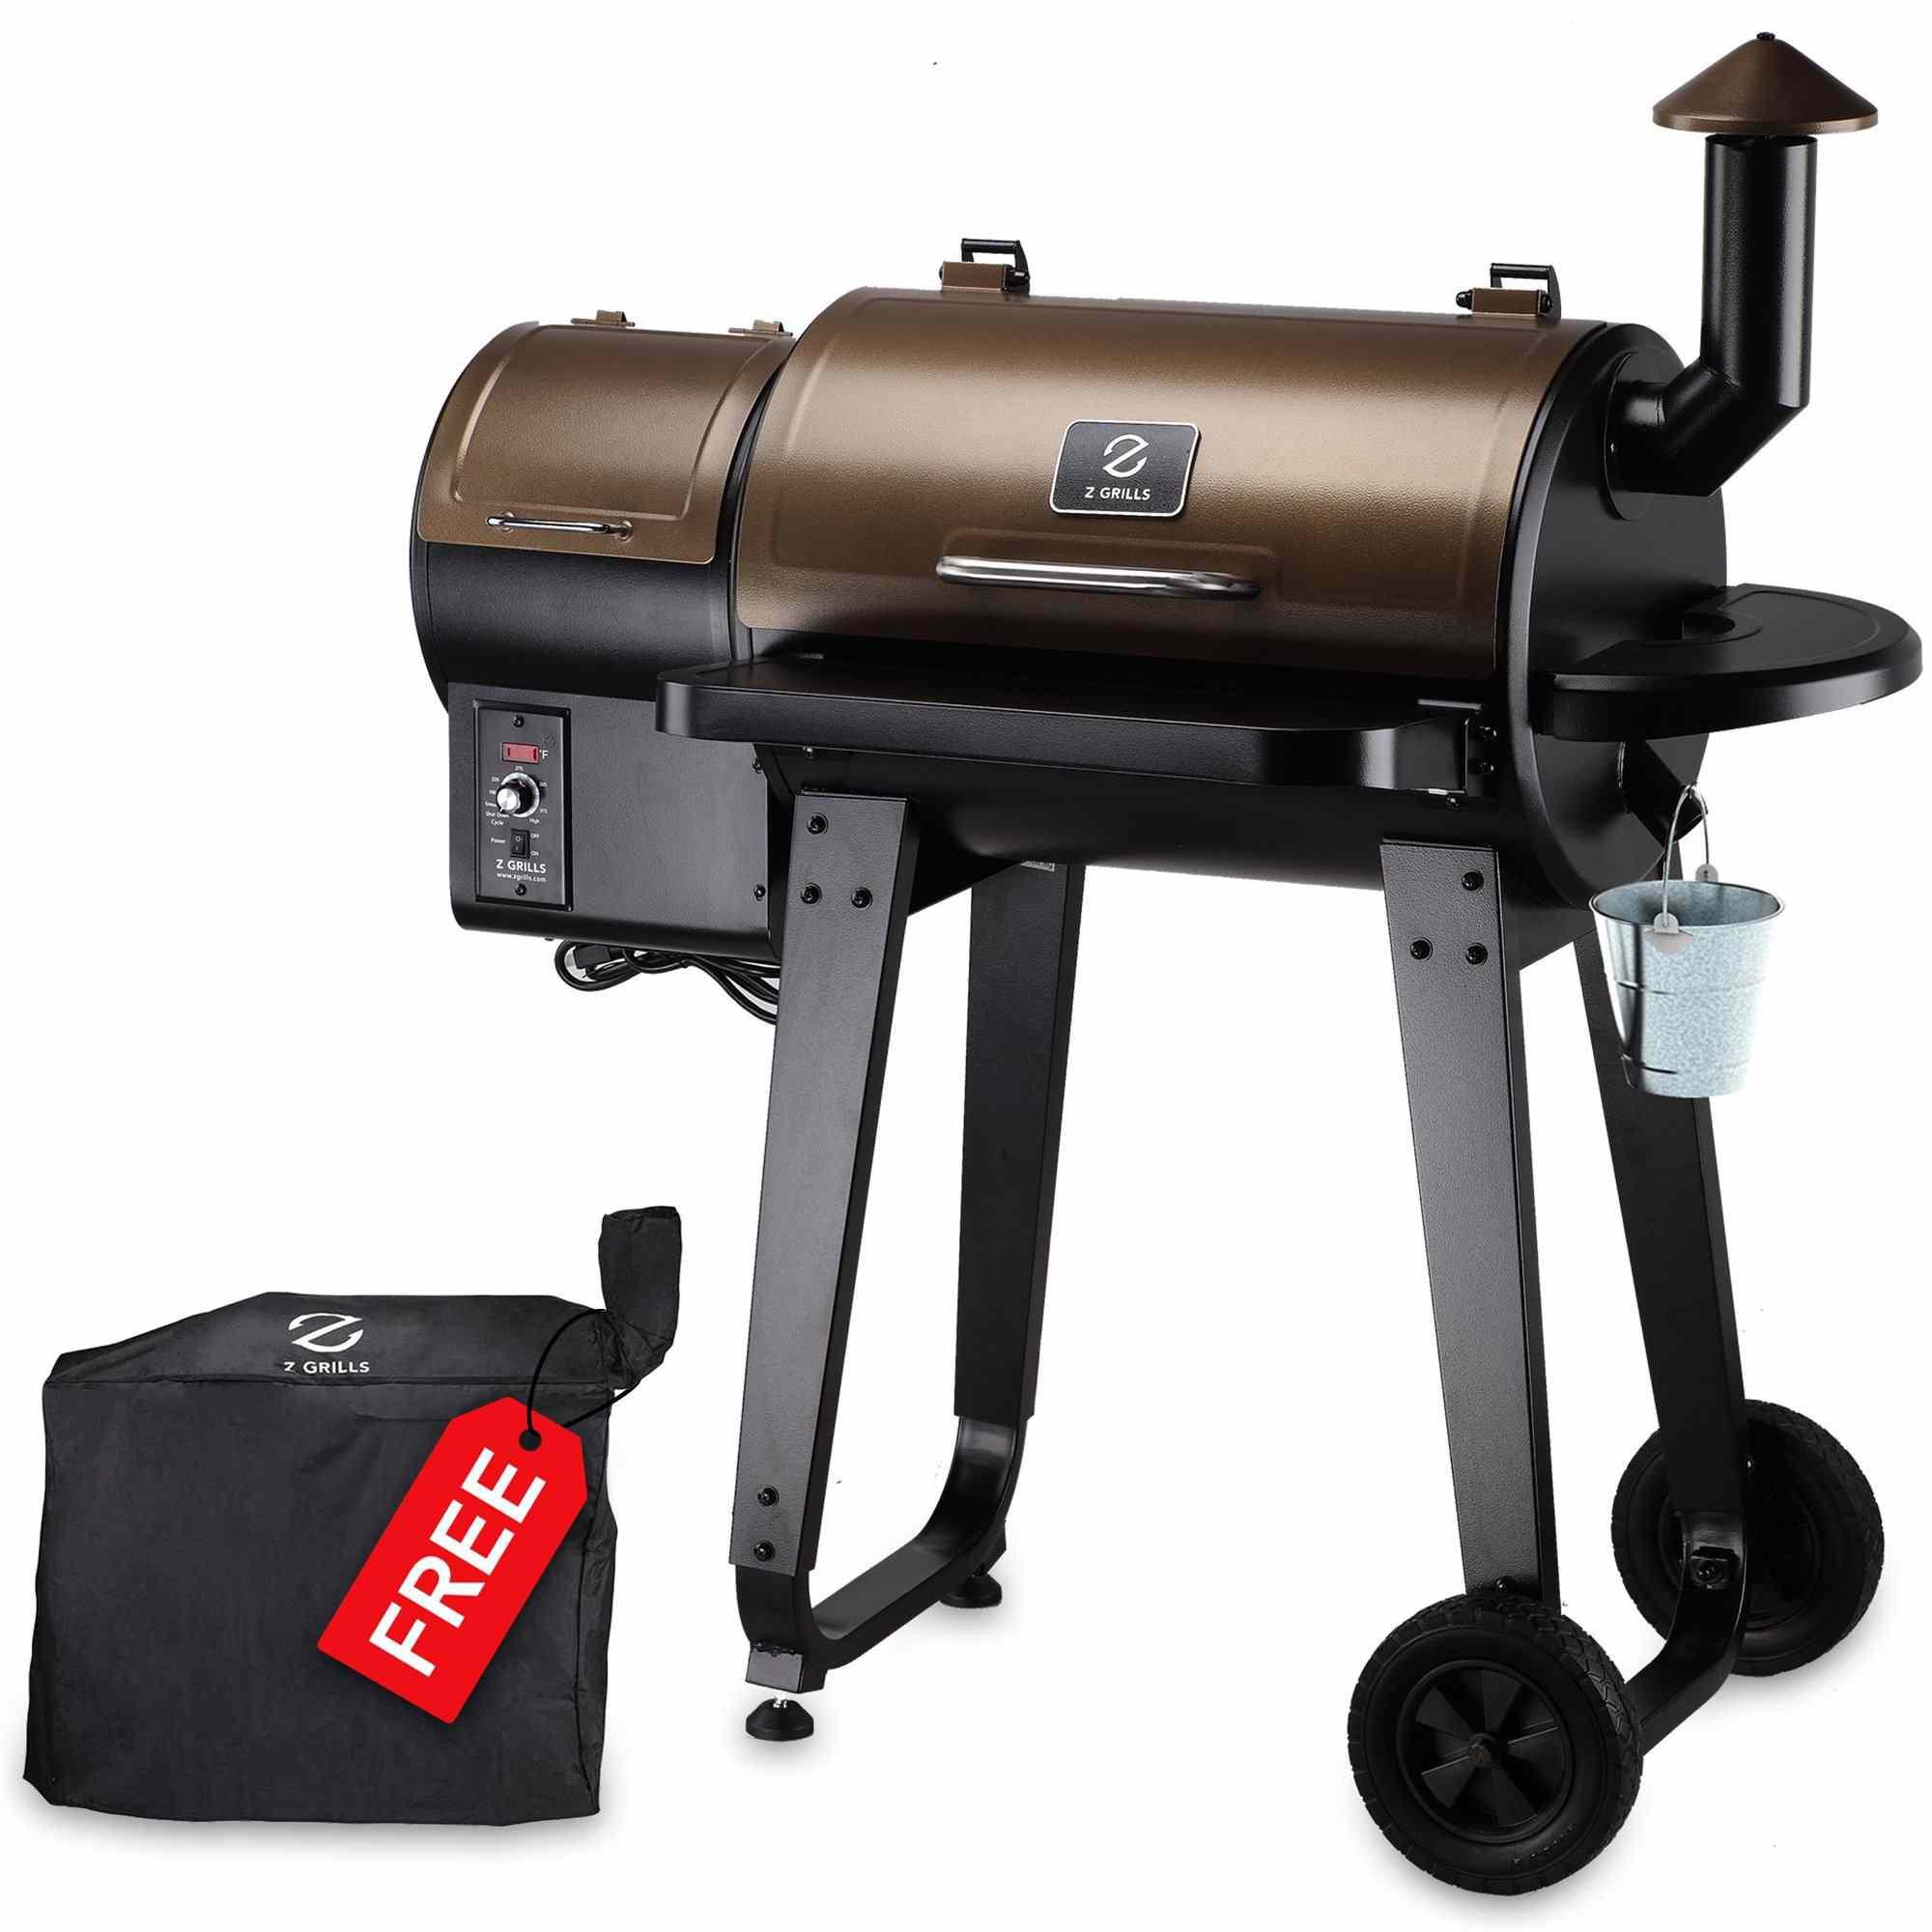 Z GRILLS ZPG-450A 2020 Upgrade Wood Pellet Grill & Smoker